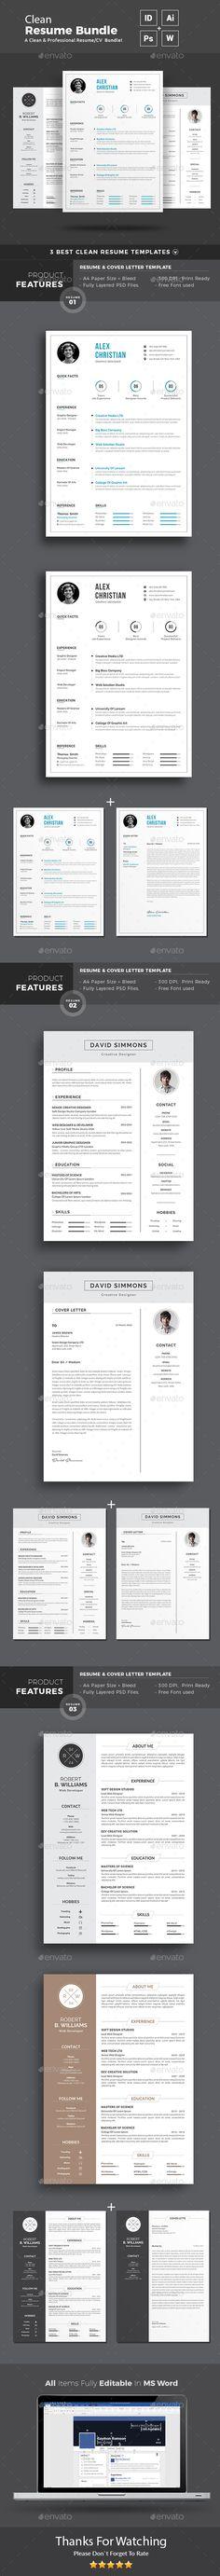 Resume Design Template Bundle - Resumes Stationery Design Template ...